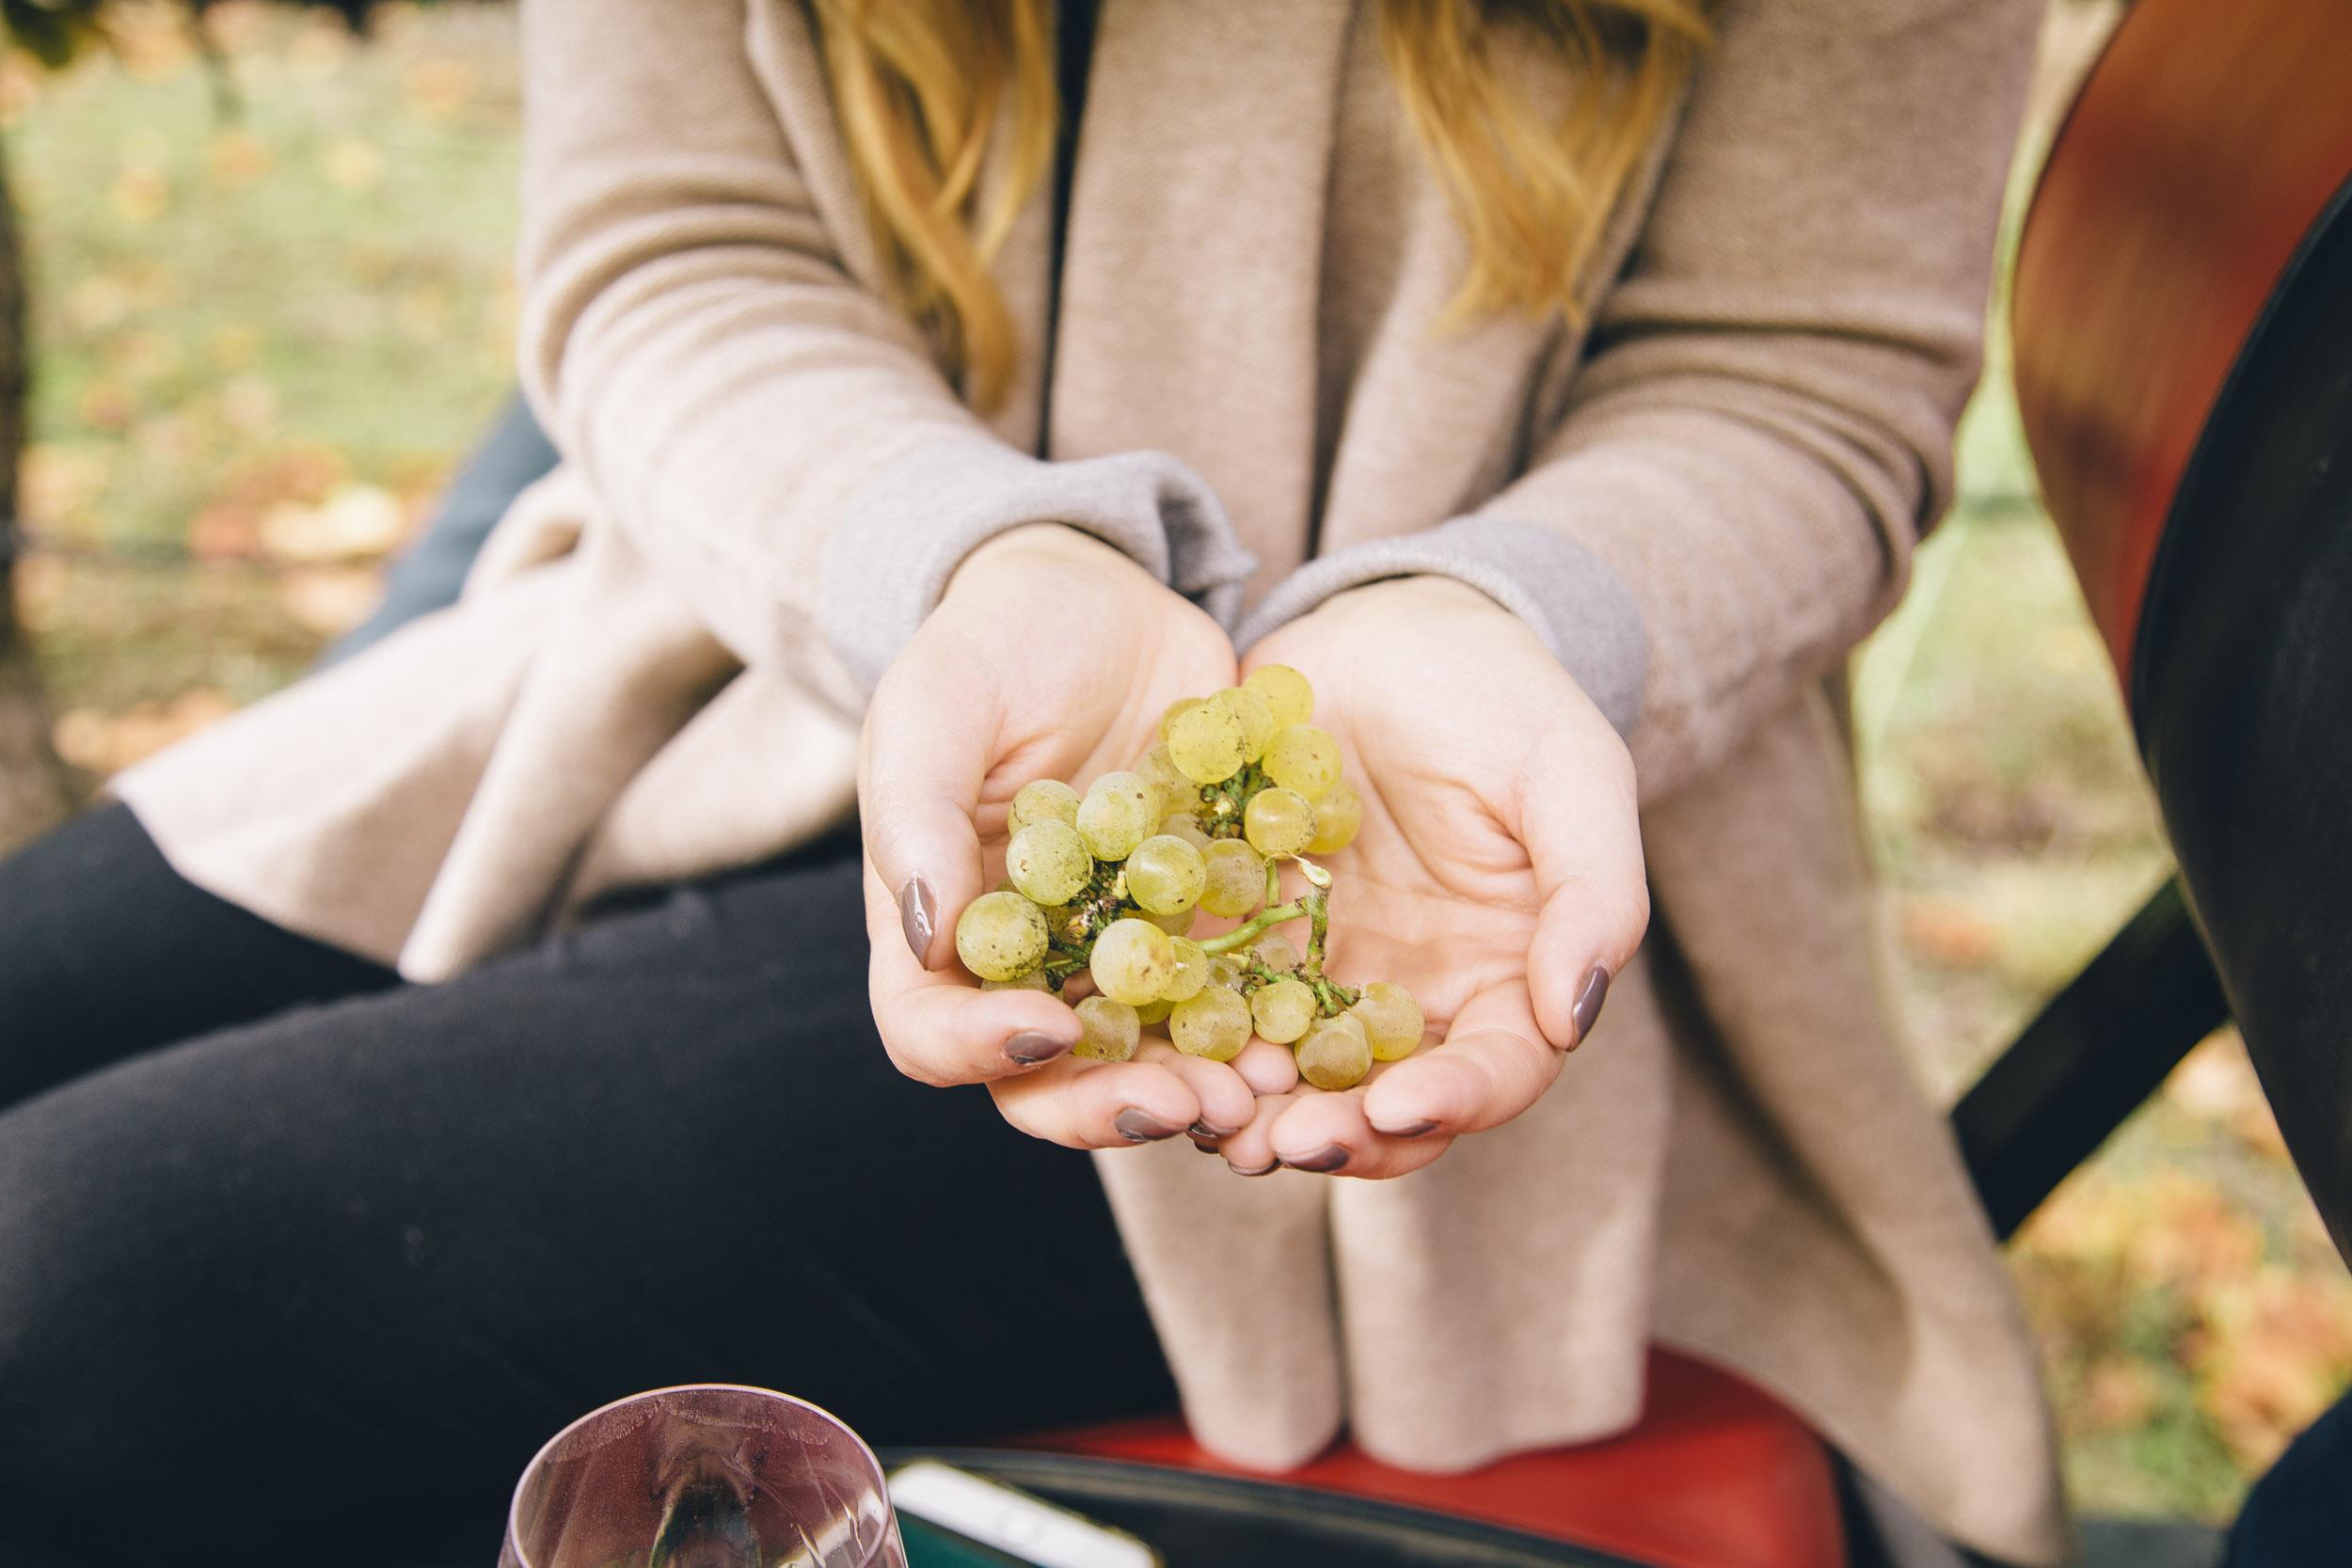 Chardonnay Grapes at La Crema | Freckled Italian